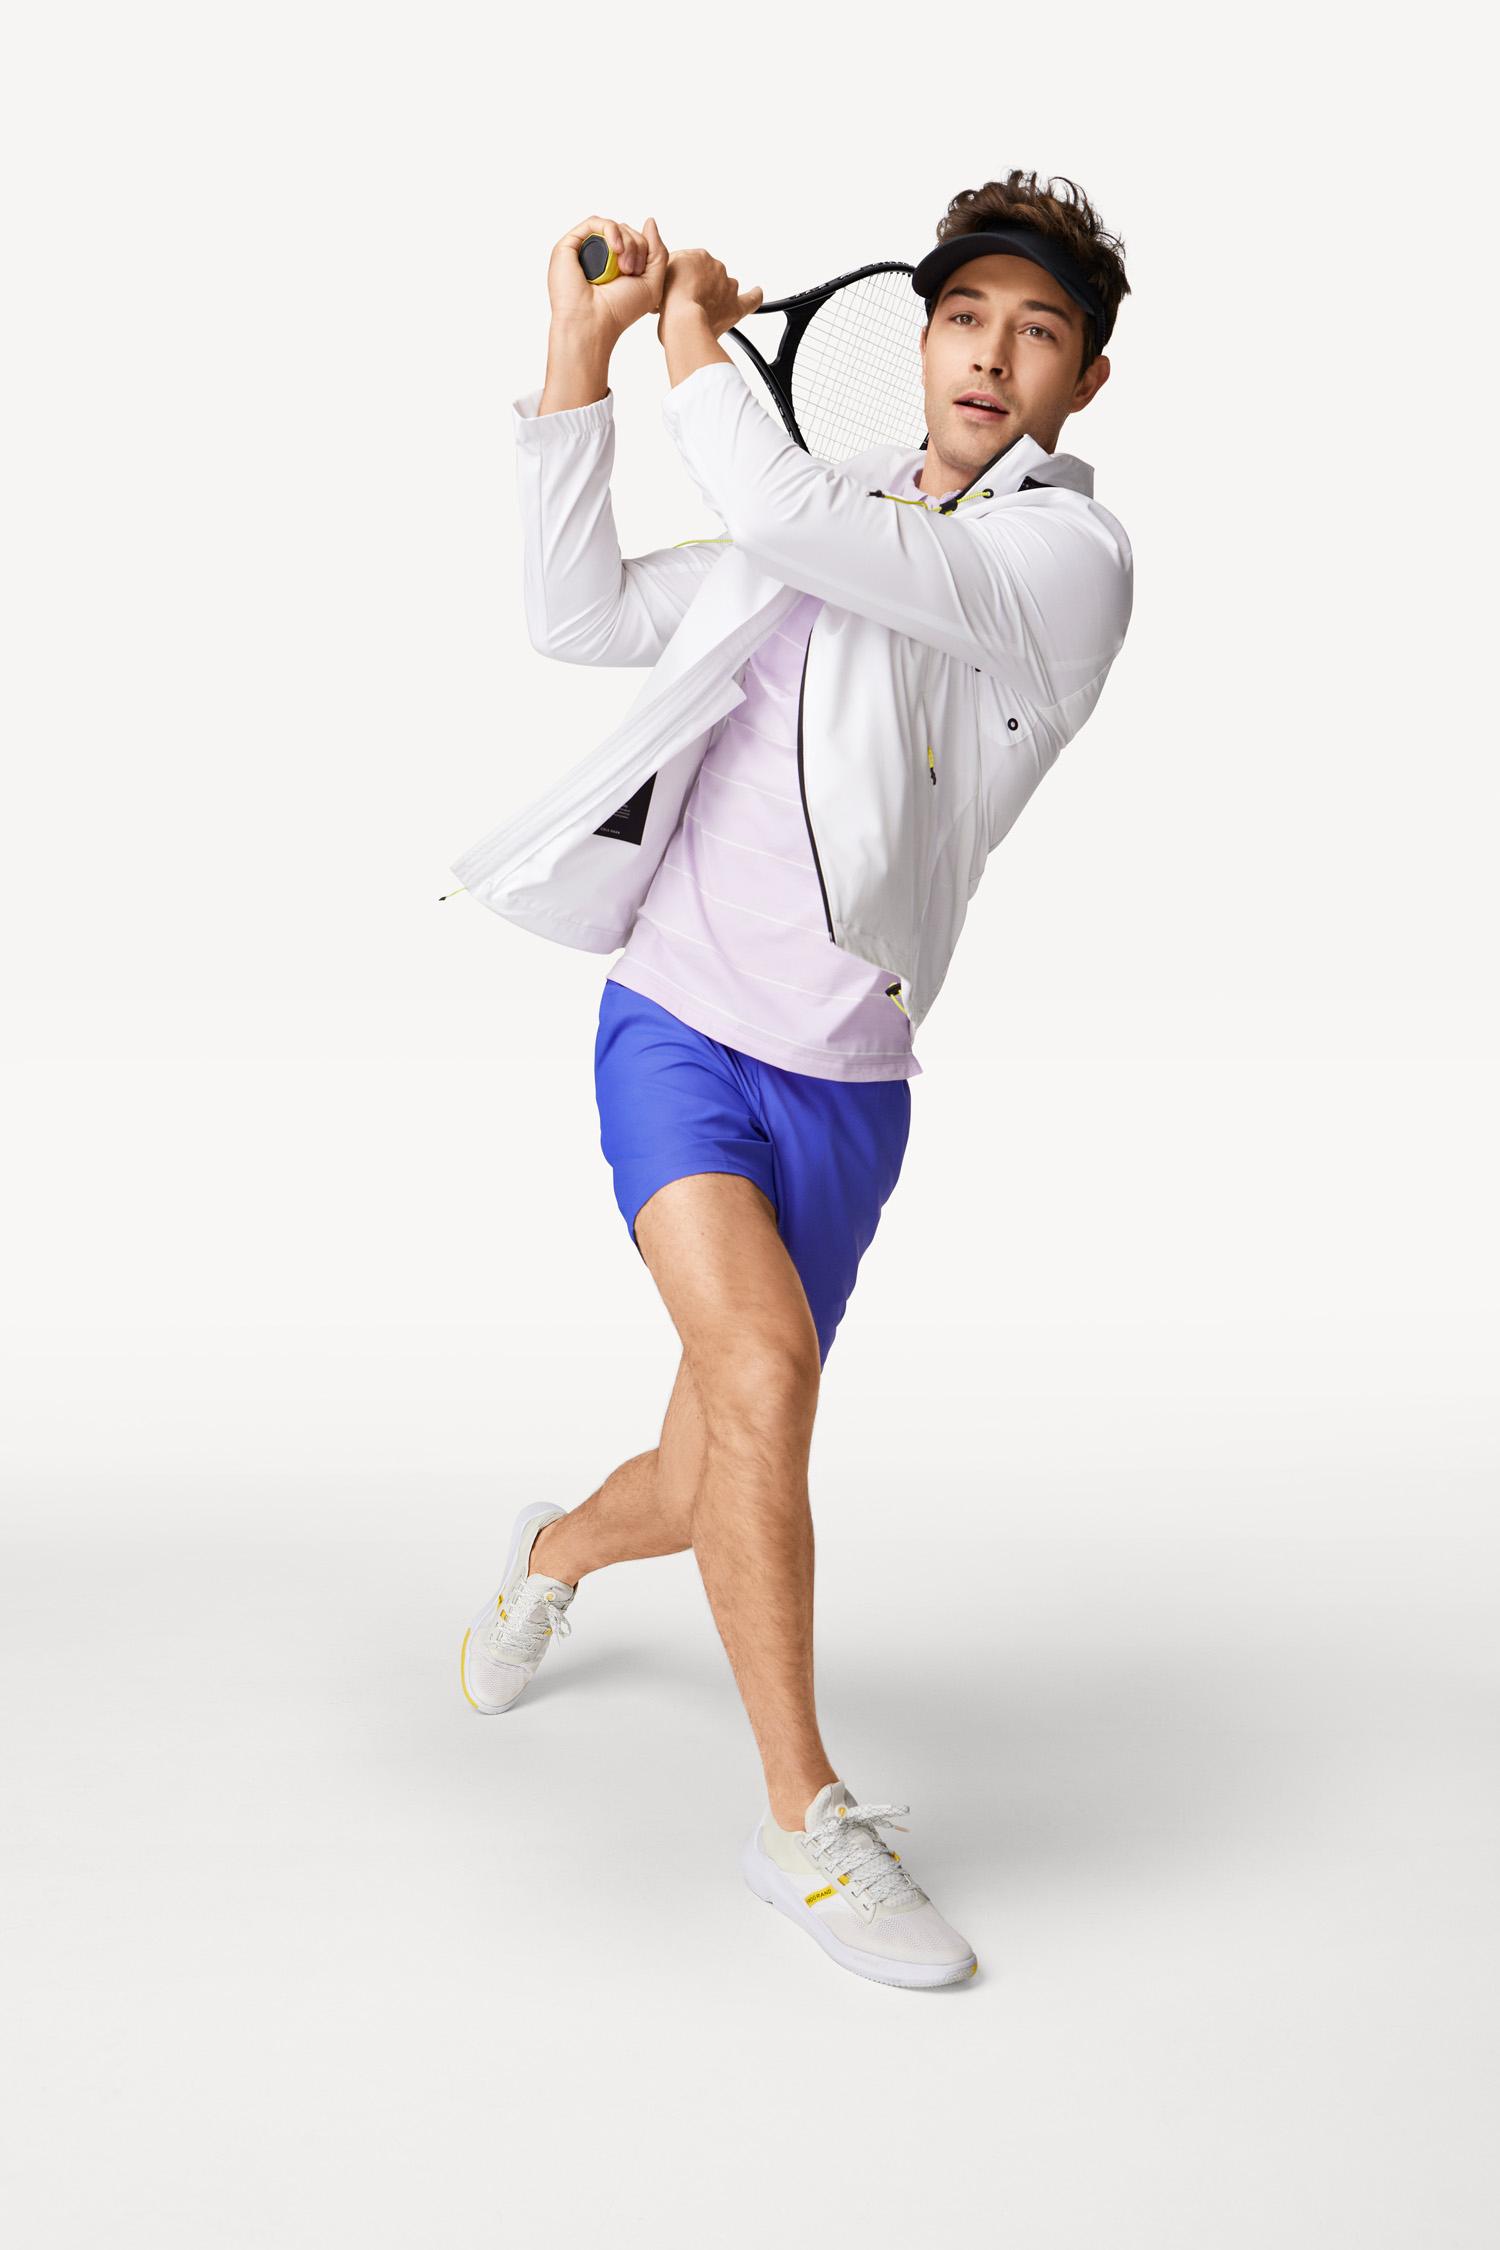 Cole Haan Men's ZERØGRAND Winner Tennis Sneaker in White, $130